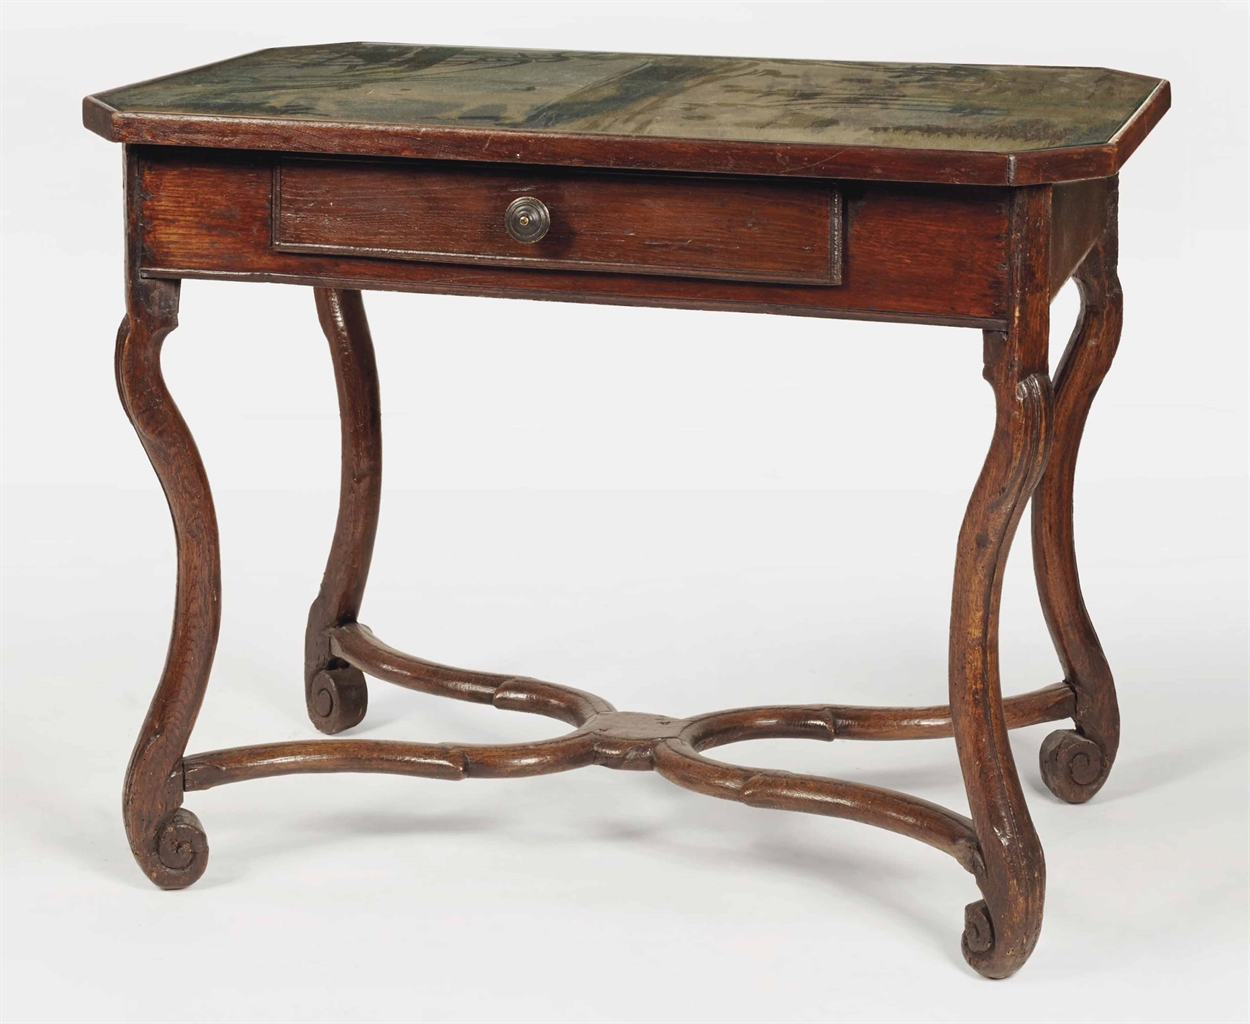 table d 39 epoque louis xiii xviieme siecle furniture lighting table christie 39 s. Black Bedroom Furniture Sets. Home Design Ideas